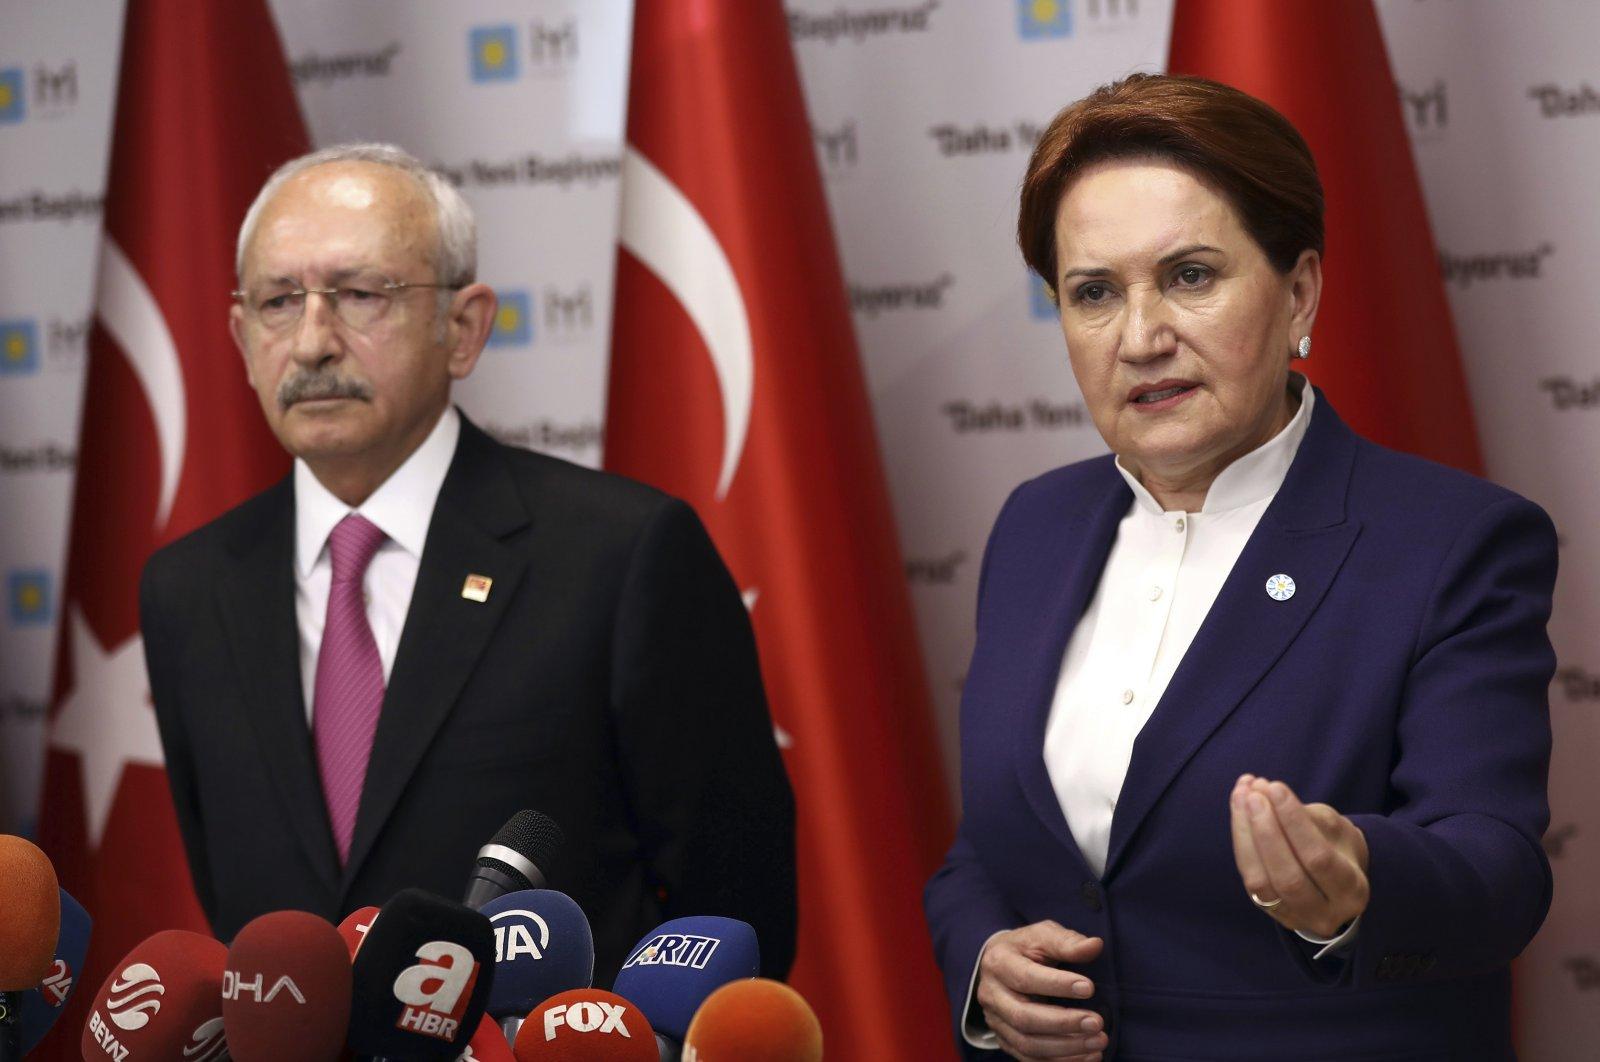 CHP Chairperson Kemal Kılıçdaroğlu (L) and IP Chairperson Meral Aksener (R) speak to the media in the Turkish capital, Ankara, Turkey, April 8, 2019. (AP File Photo)